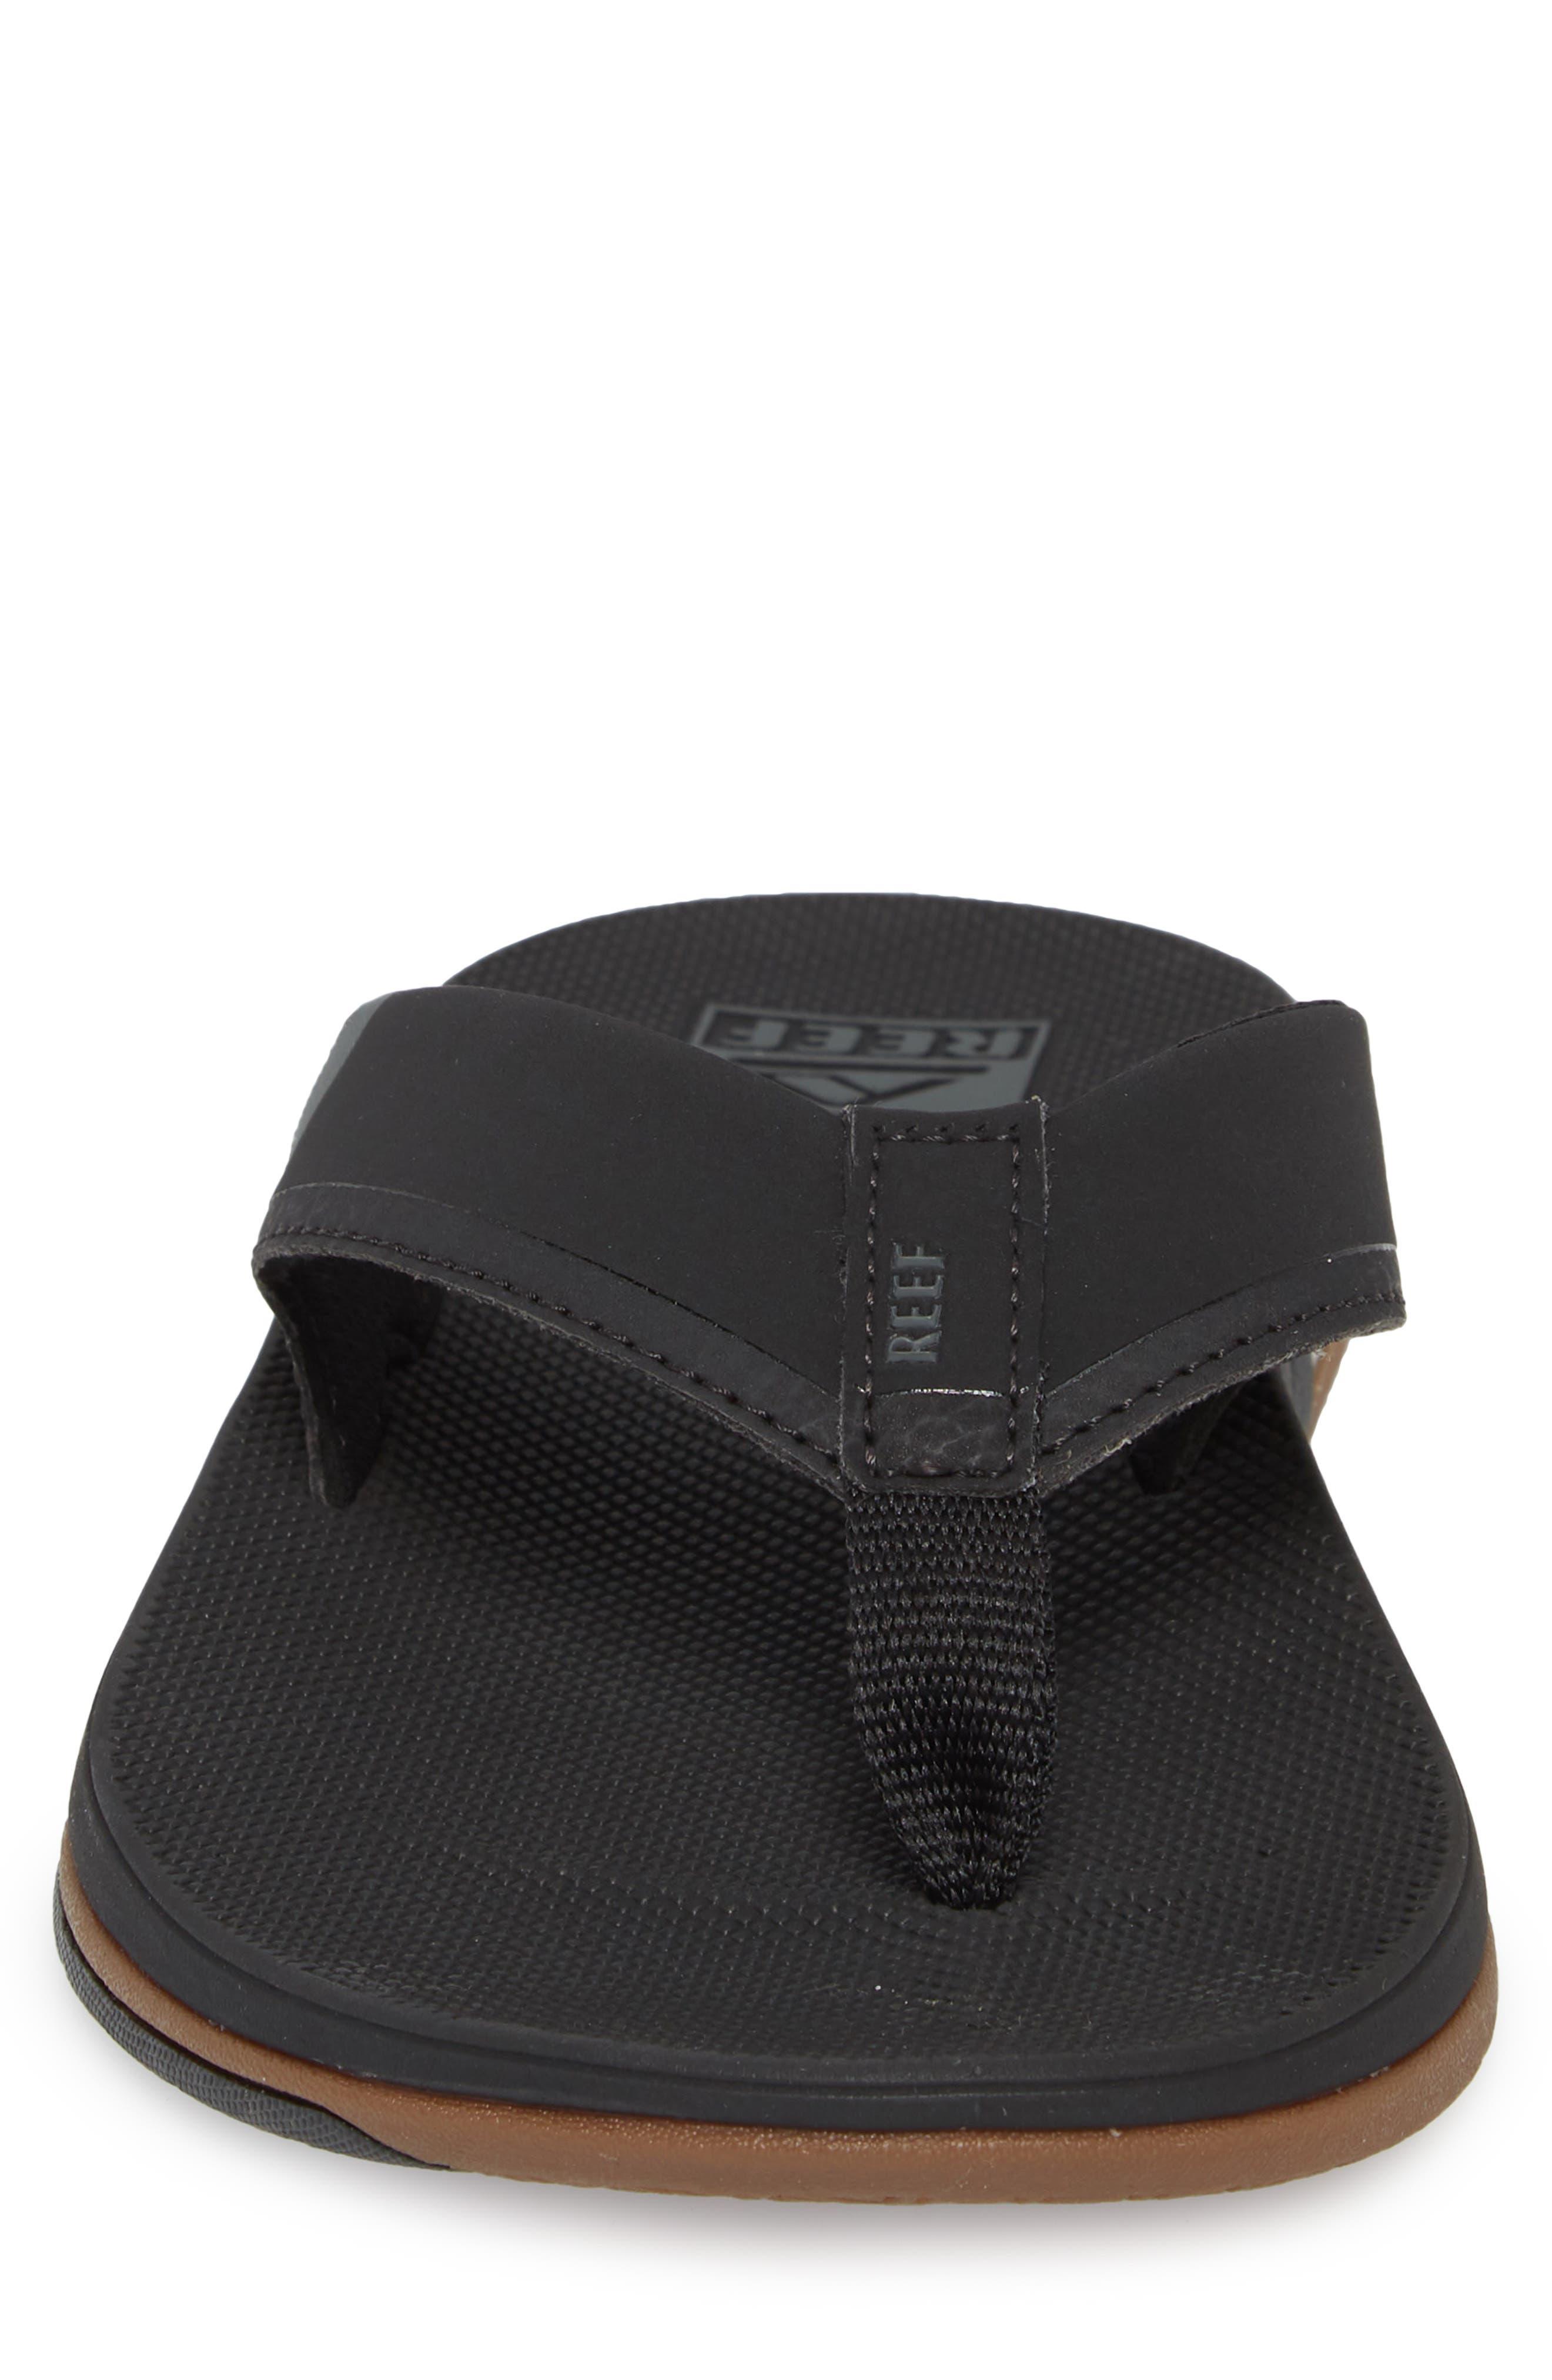 REEF, Fanning Low Flip Flop, Alternate thumbnail 4, color, BLACK